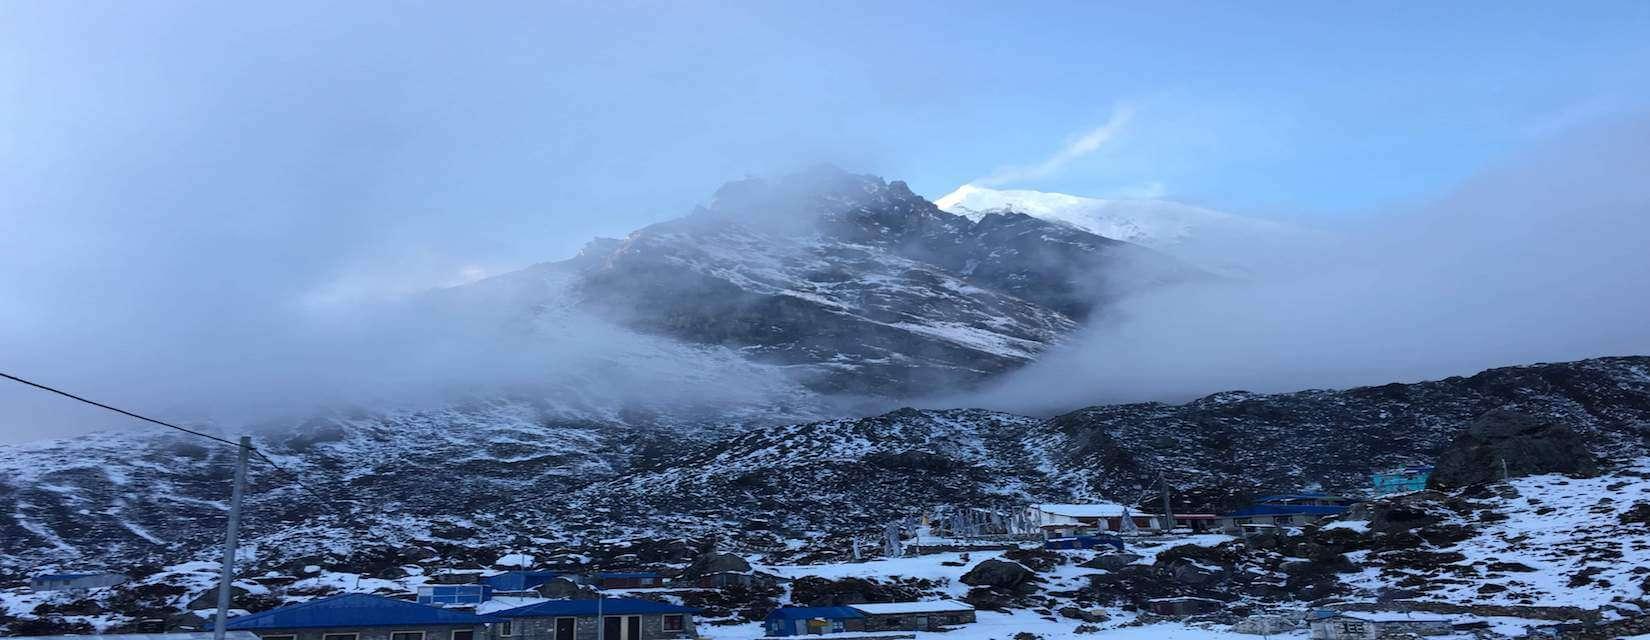 Glance of Nepal